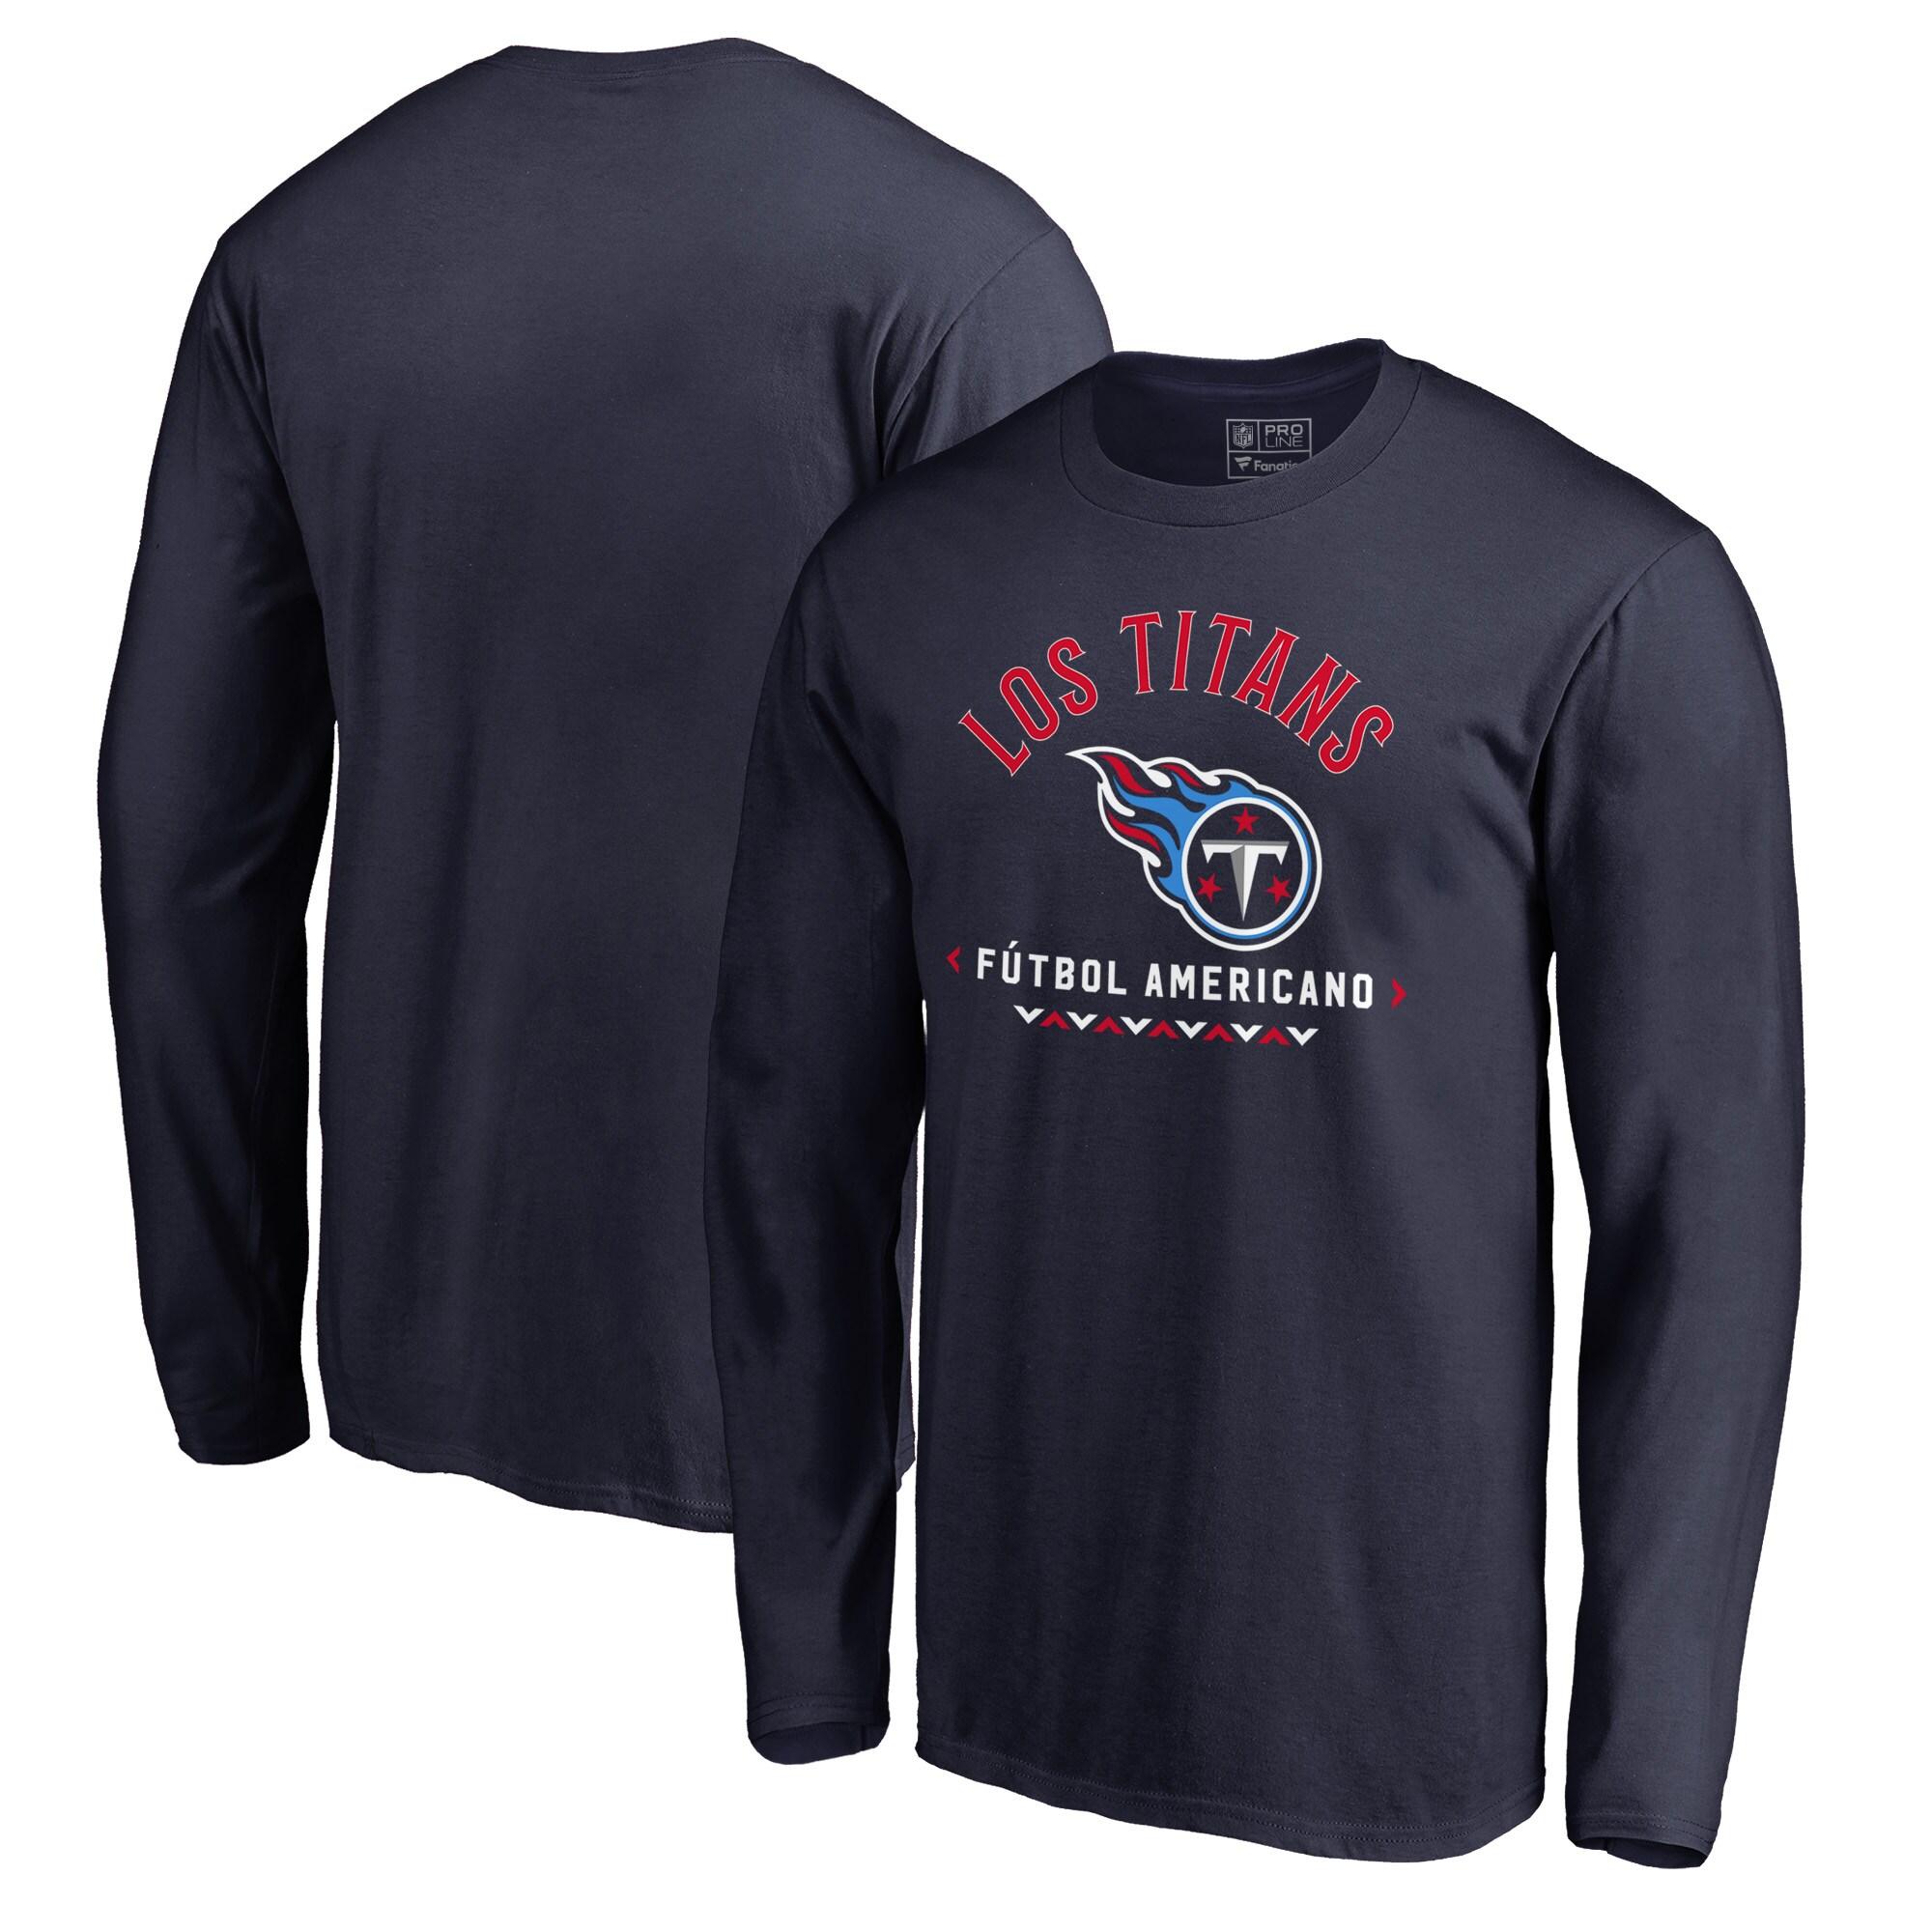 Tennessee Titans NFL Pro Line by Fanatics Branded Futbol Americano Long Sleeve T-Shirt - Navy